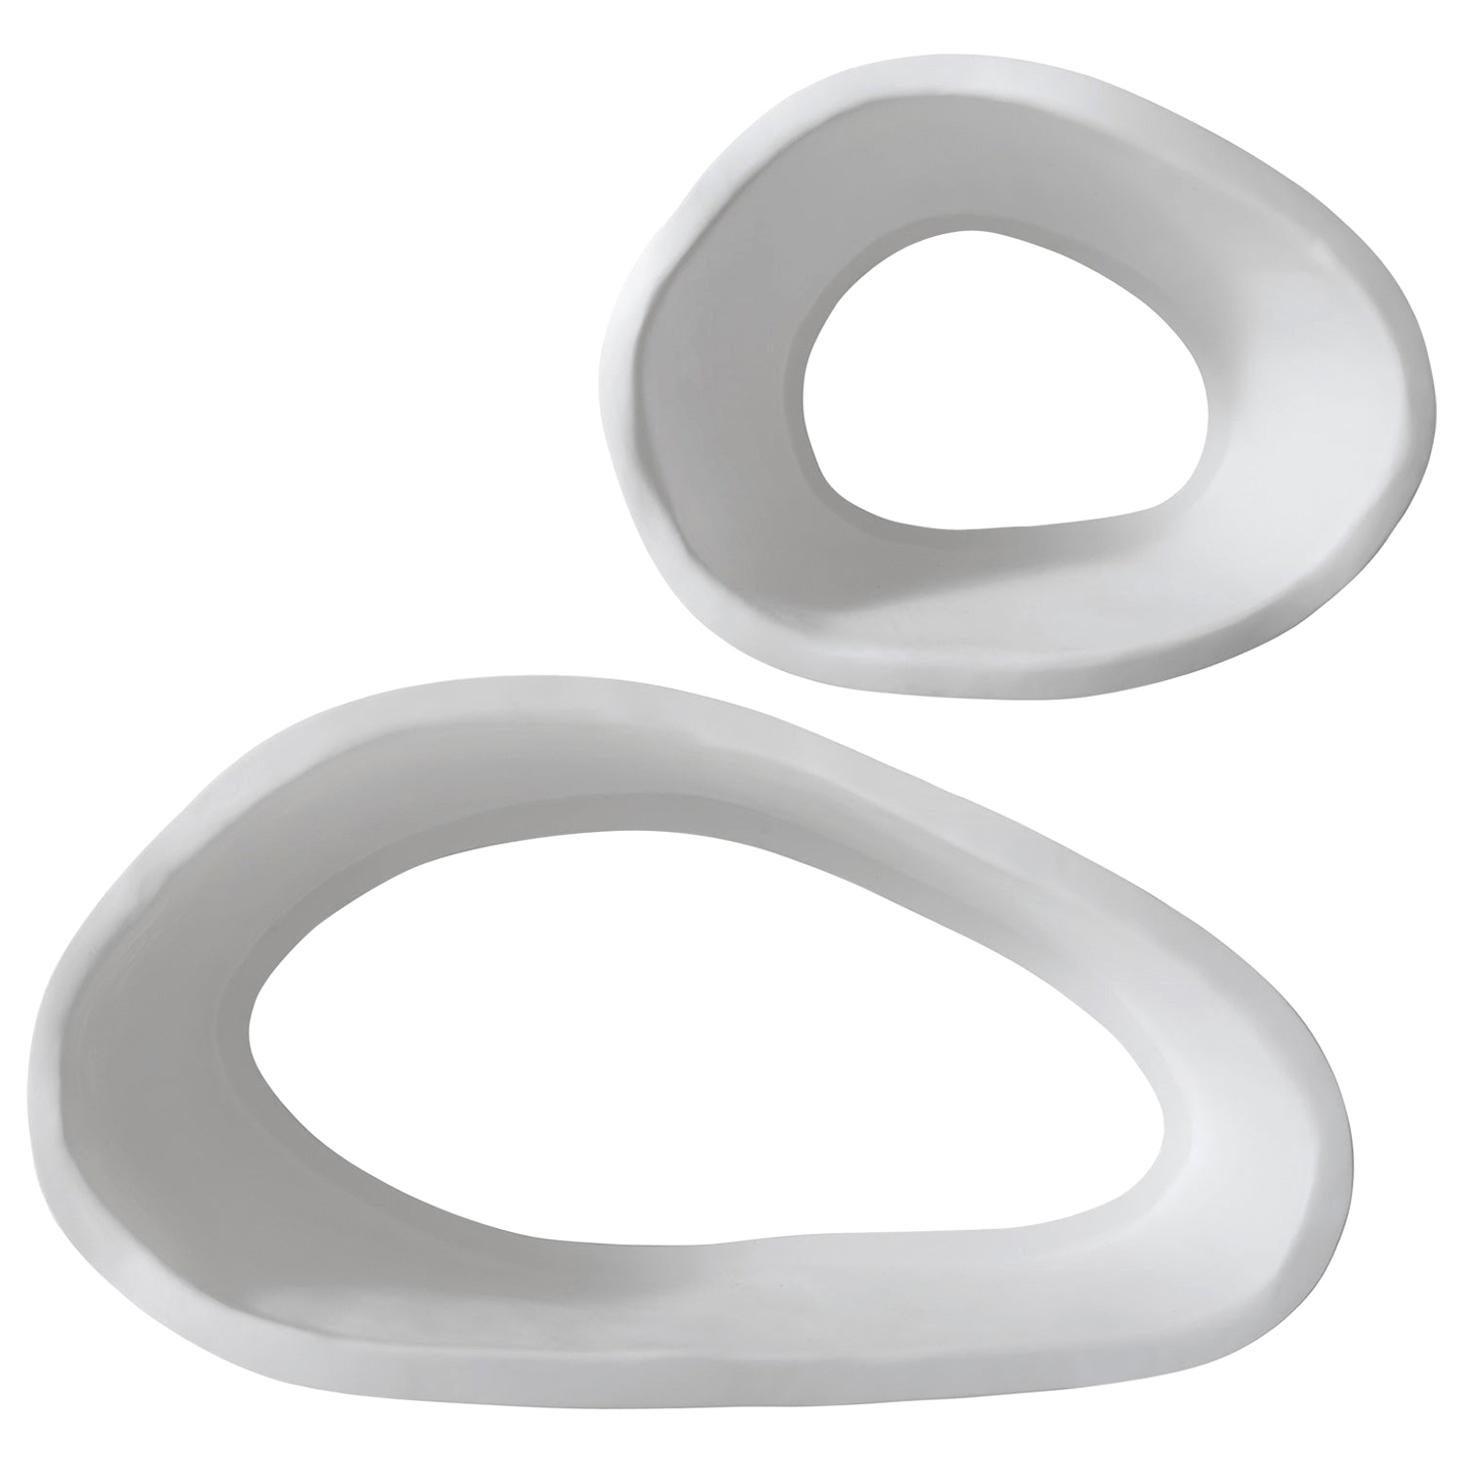 21st Century Verter Turroni White Fibreglass Modular Bookshelf Shelf Shelving